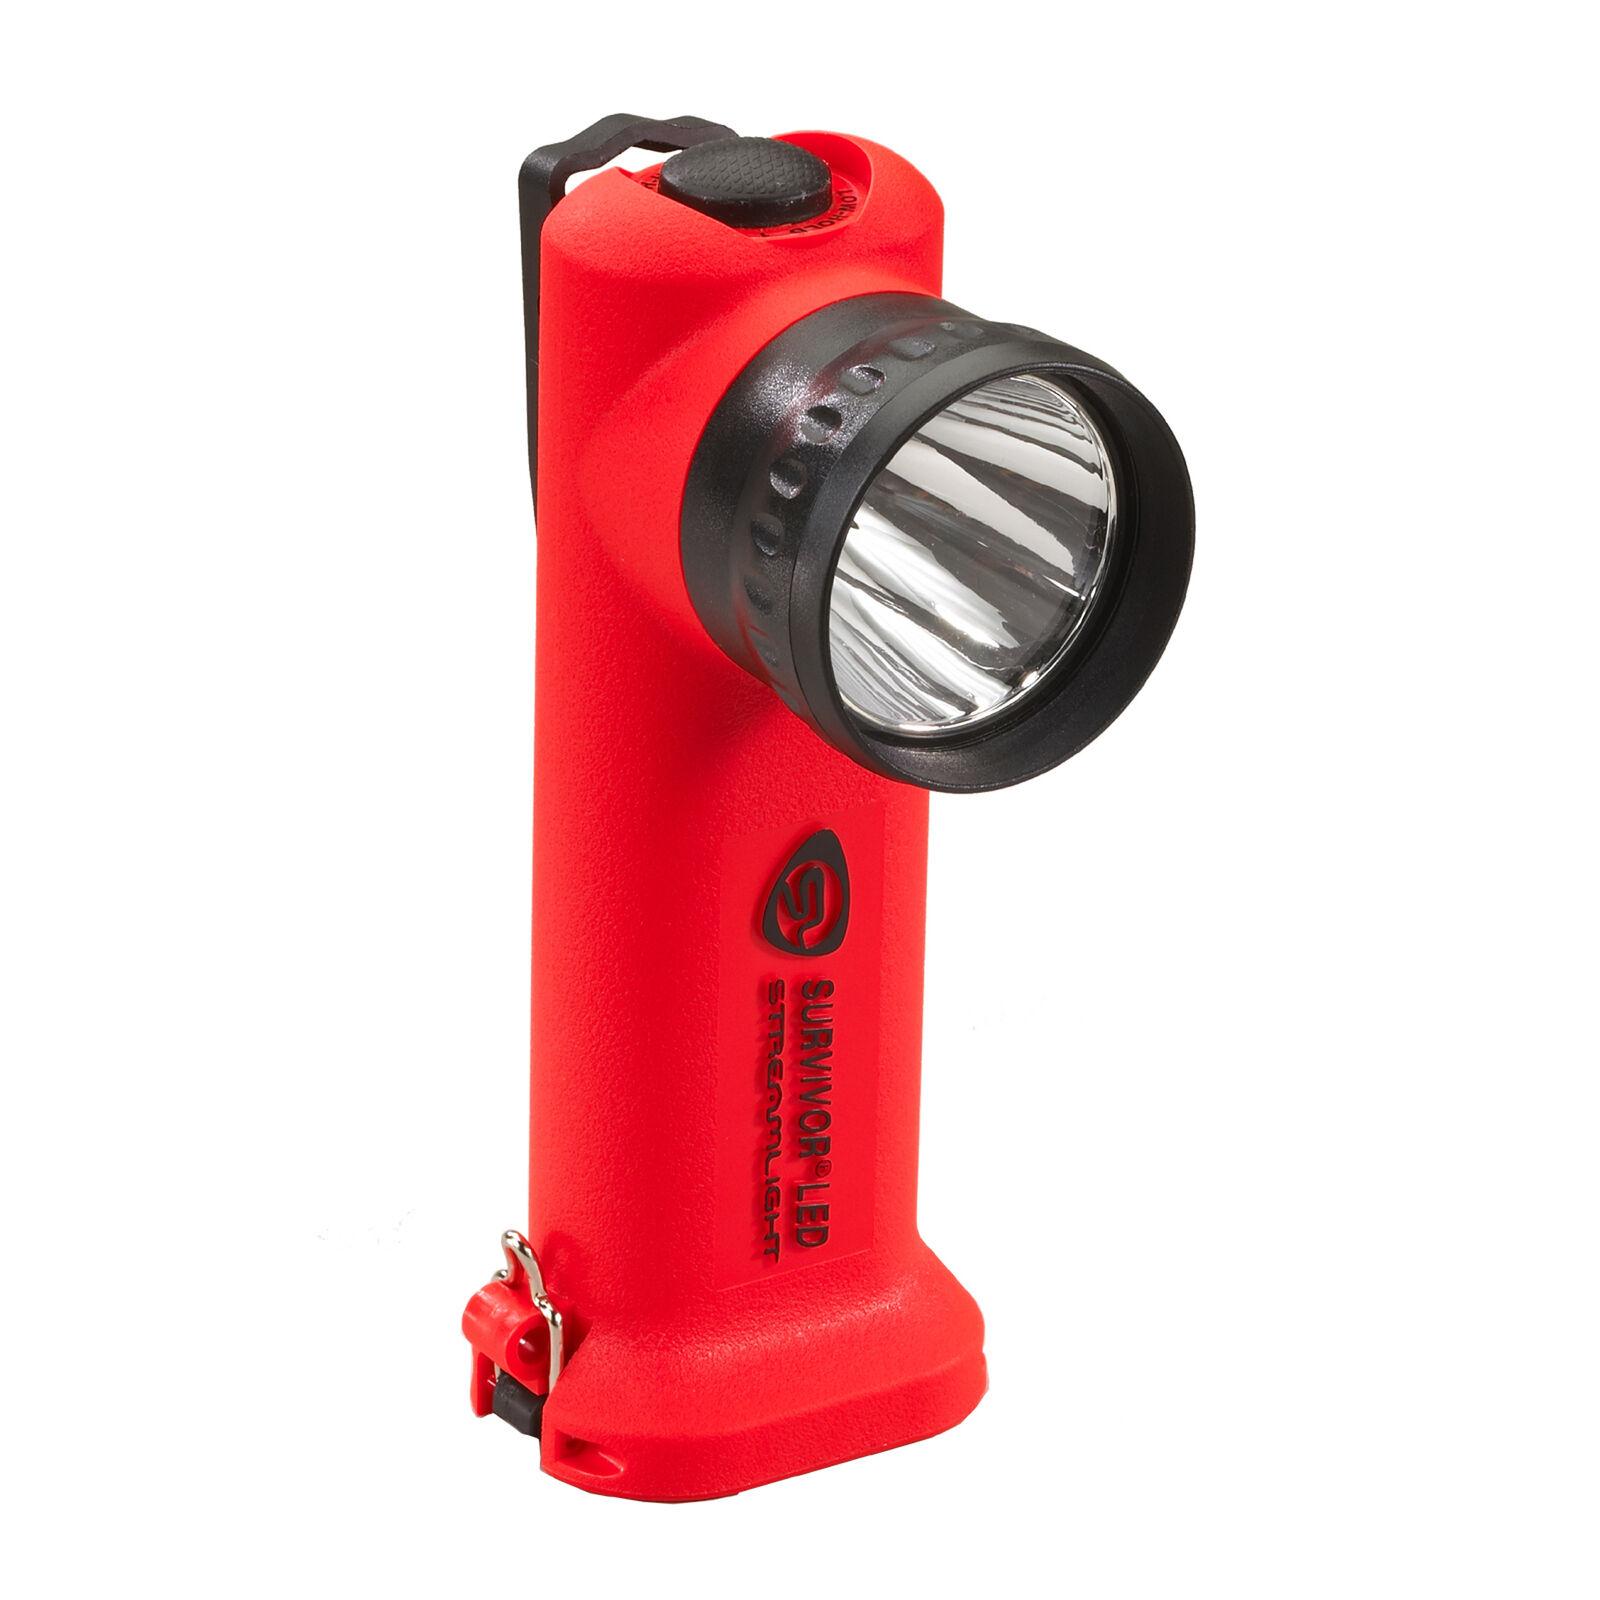 Streamlight Überlebender Wiederaufladbar Led Rechtwinklig Rechtwinklig Rechtwinklig Taschenlampe (No Lade f35335